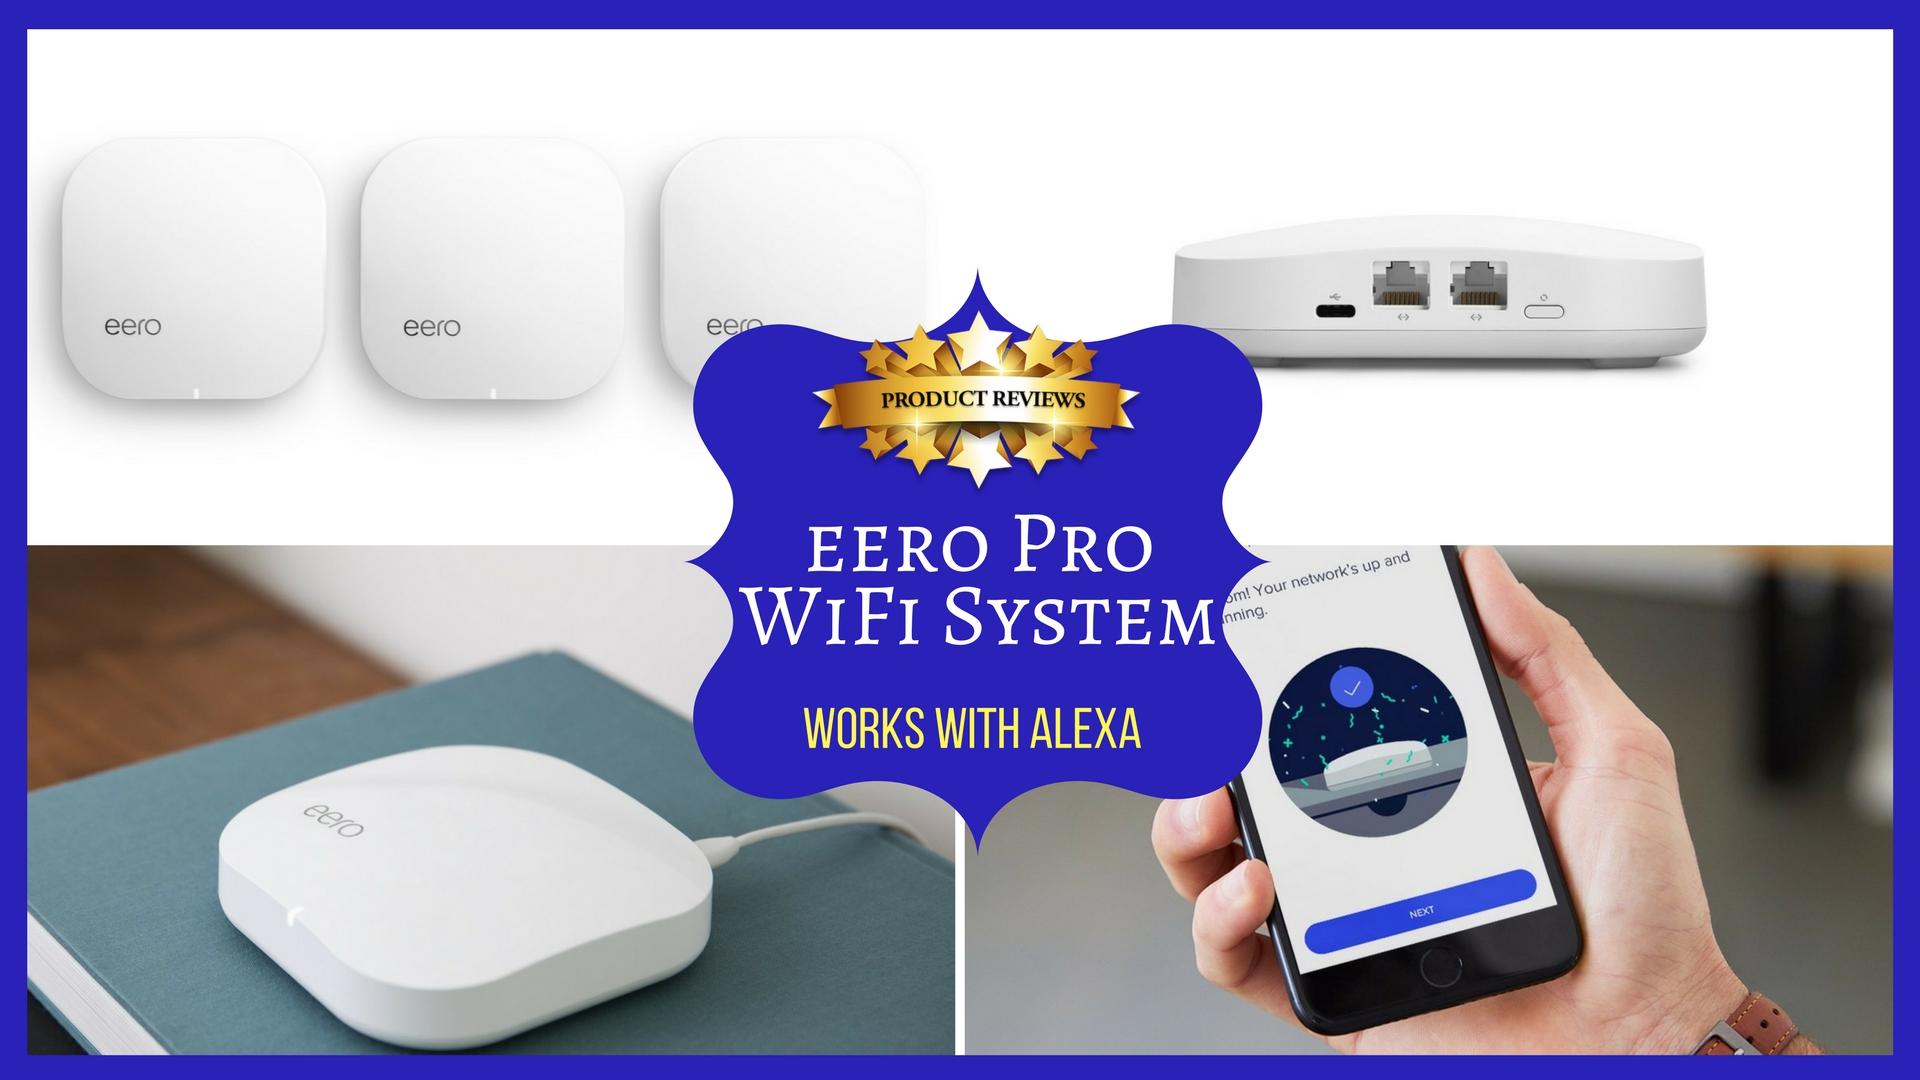 eero Pro WiFi System - Works with Alexa